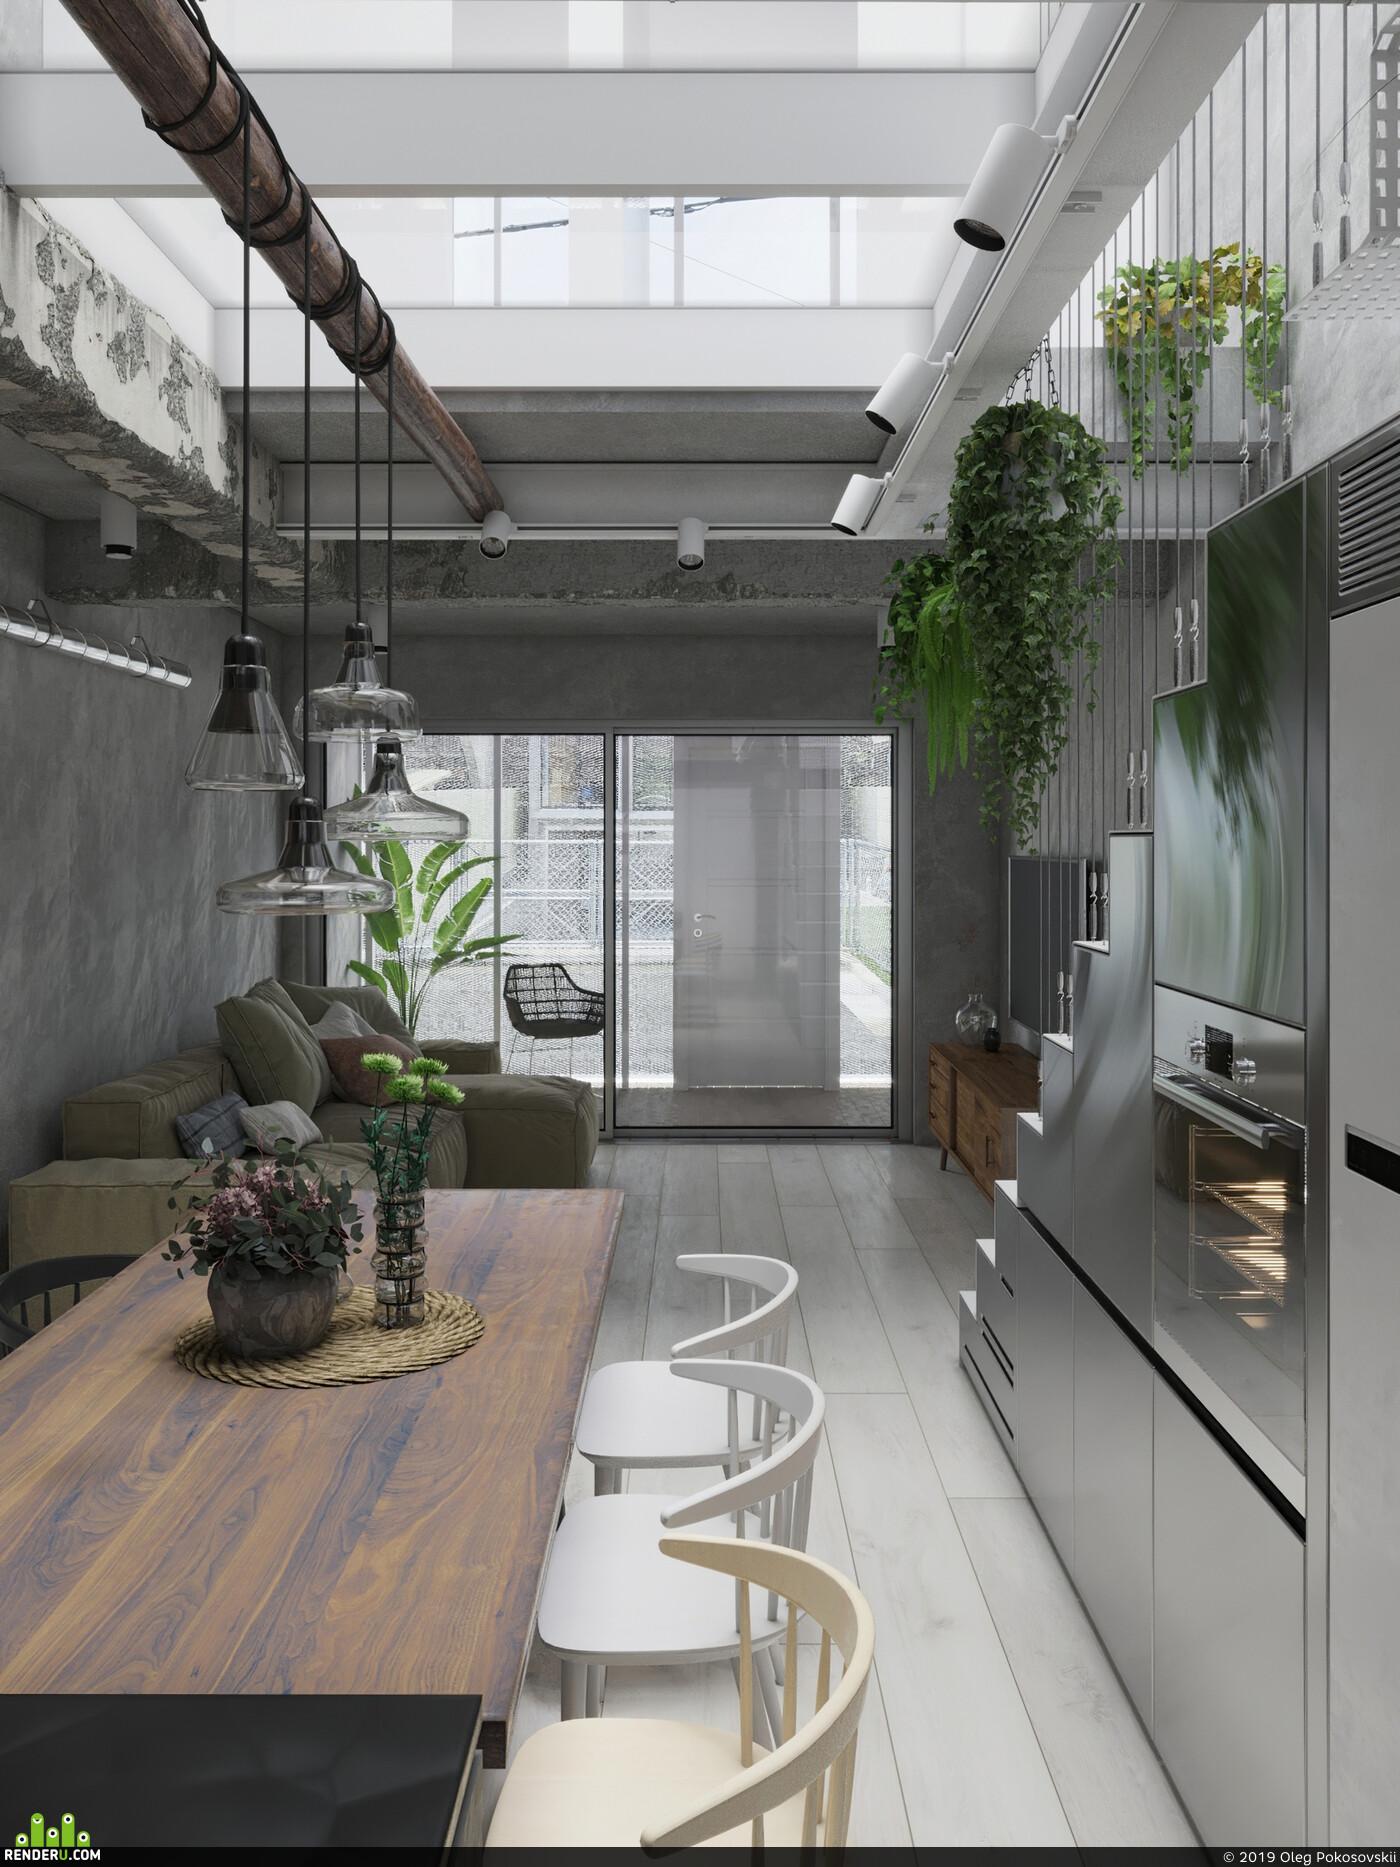 interior design, visualisation, 3D Studio Max, loftstyle, loftkitchen, 3d kitchen, kitchendesign